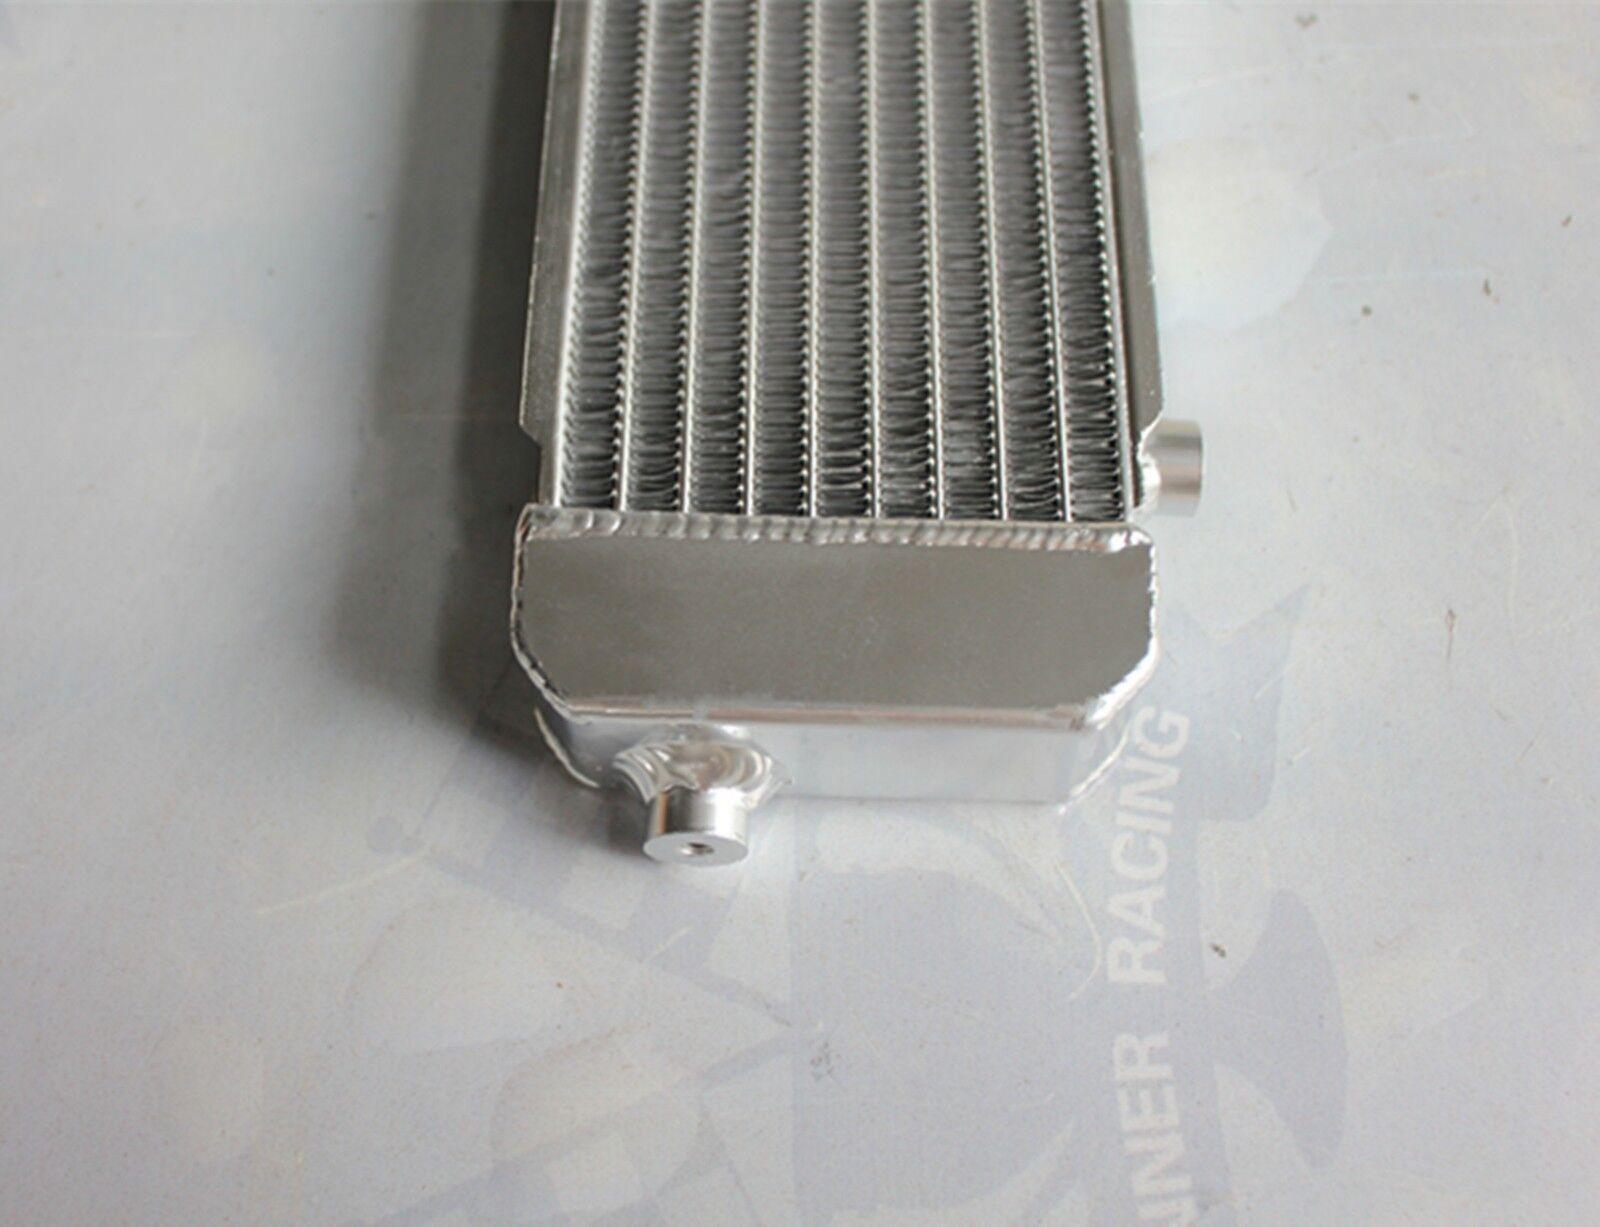 64MM COOLING INTERCOOLER FIT AUDI 200 C3 QUATTRO 3B 20V TURBO ENGINE 1989-1991